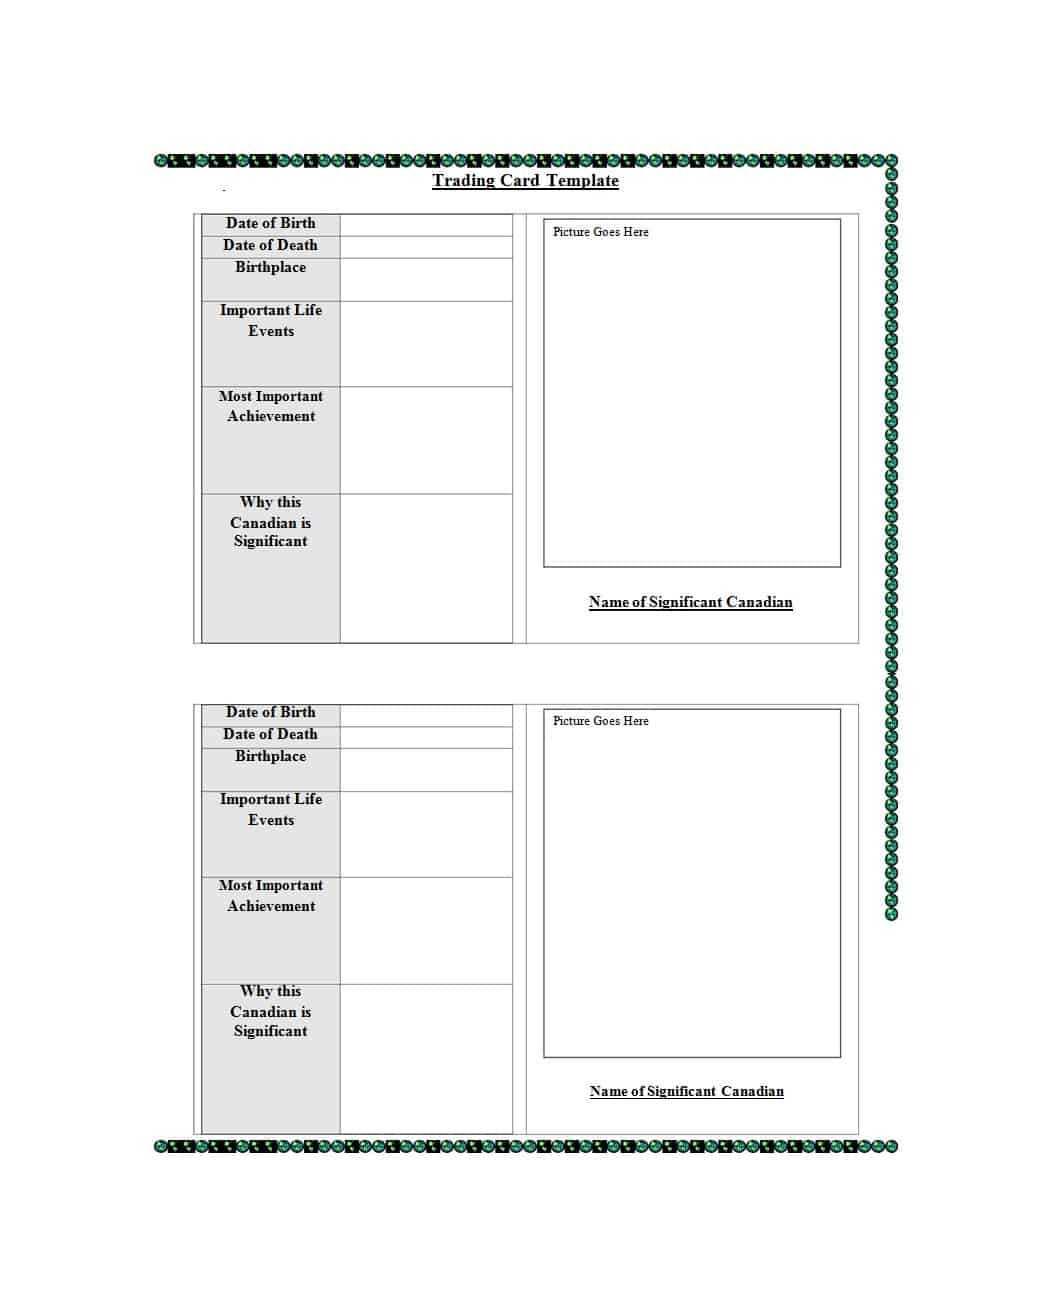 33 Free Trading Card Templates (Baseball, Football, Etc For Free Trading Card Template Download